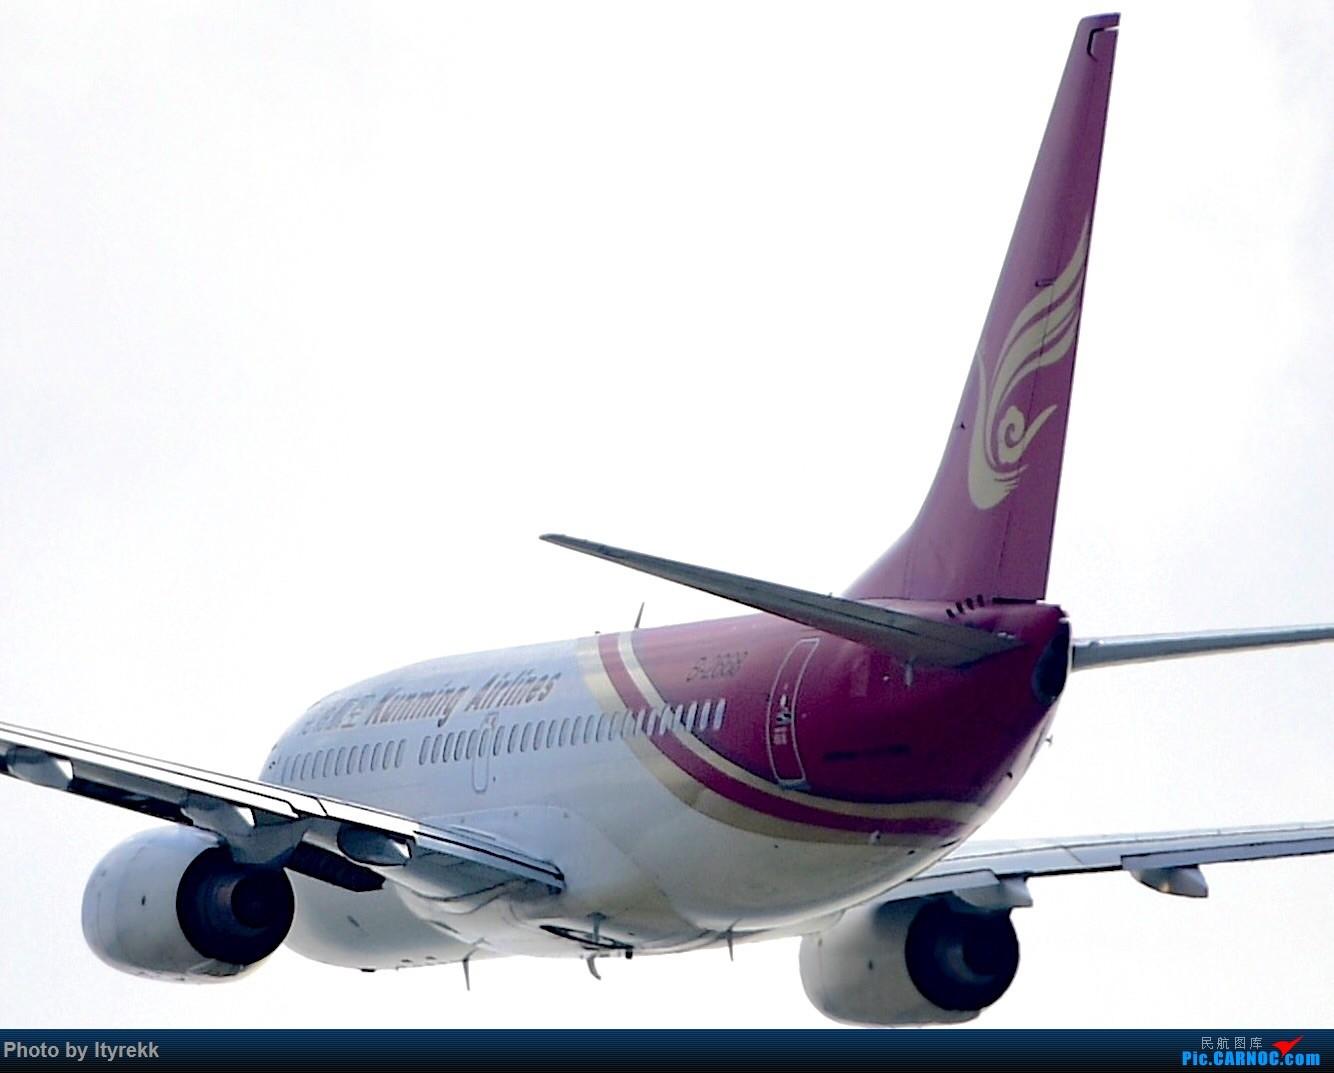 Re:[原创]【5.23LUM】玩腻了楼顶拍,来一次现场版的!求小飞机 BOEING 737-700 B-2668 中国芒市机场